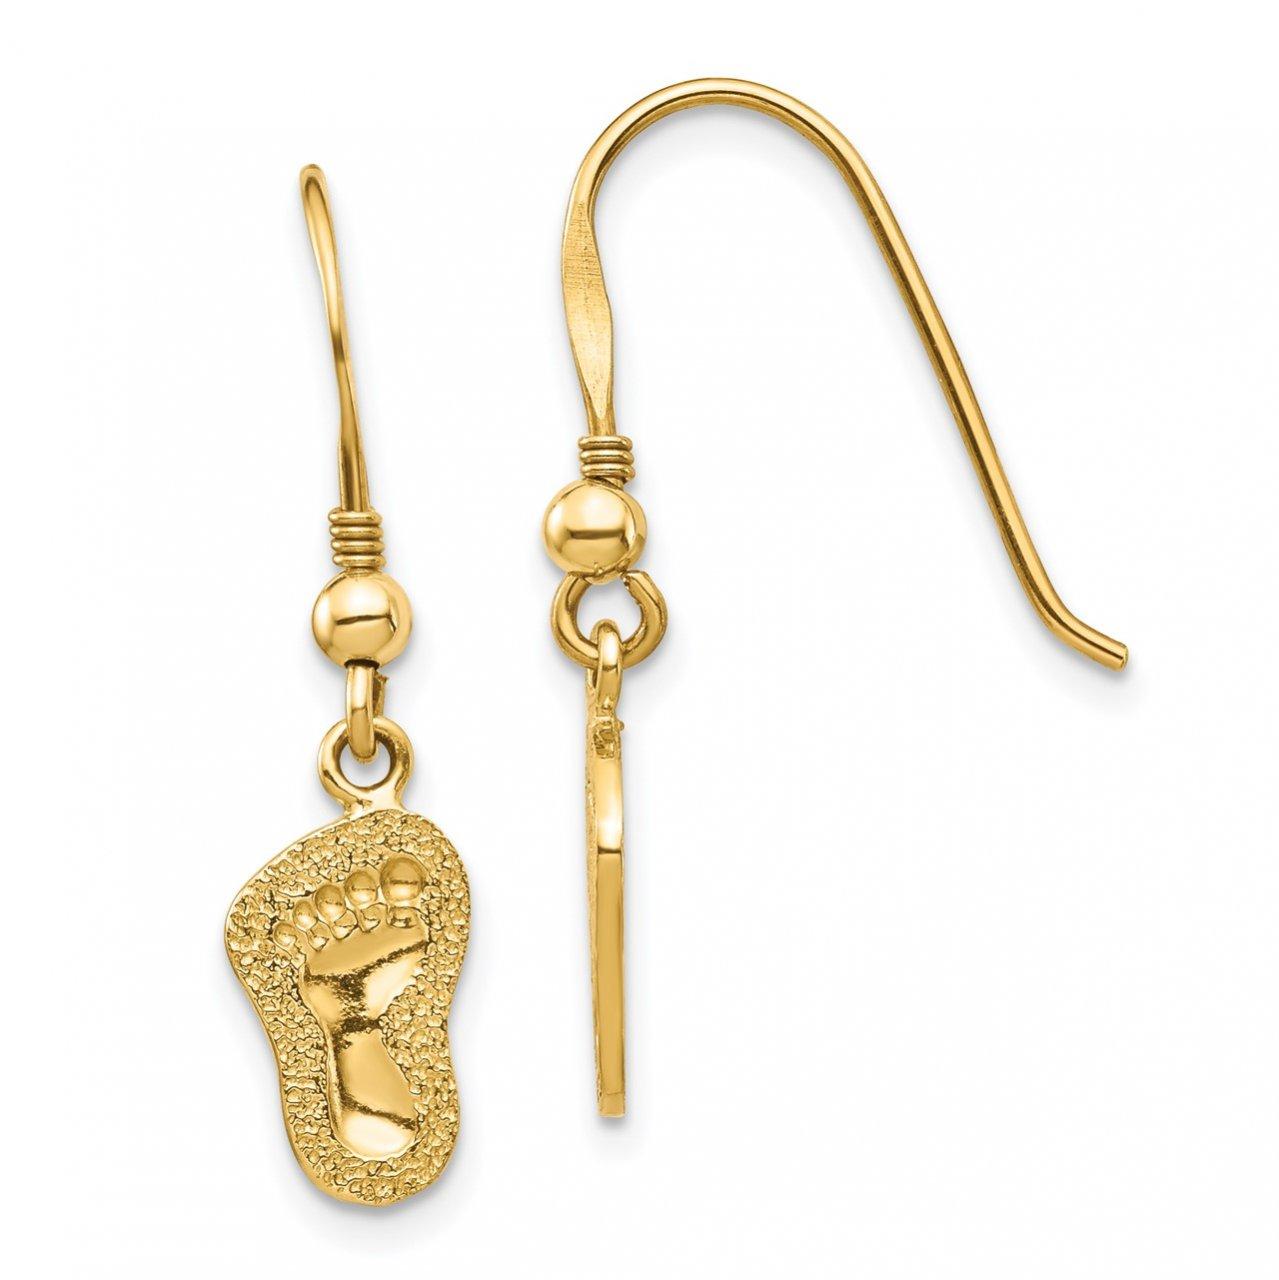 14K Footprints Shepherd Hook Earrings